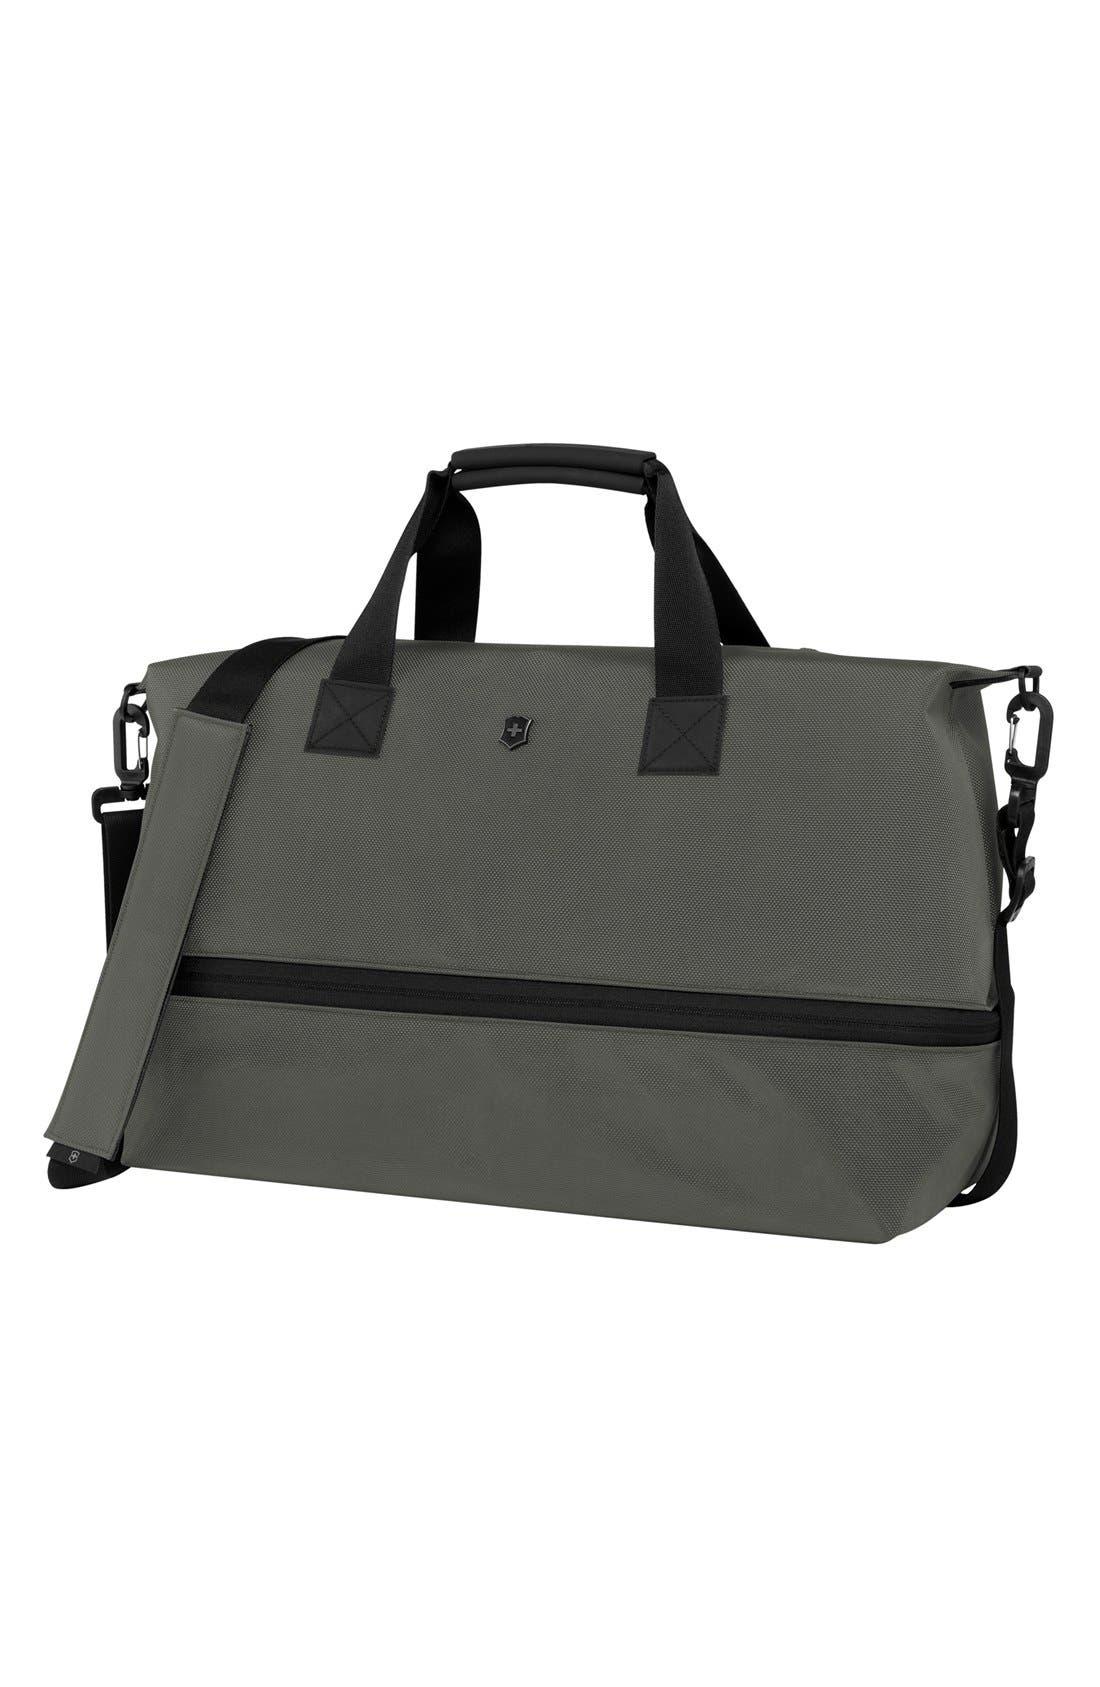 Alternate Image 1 Selected - Victorinox Swiss Army® Duffel Bag